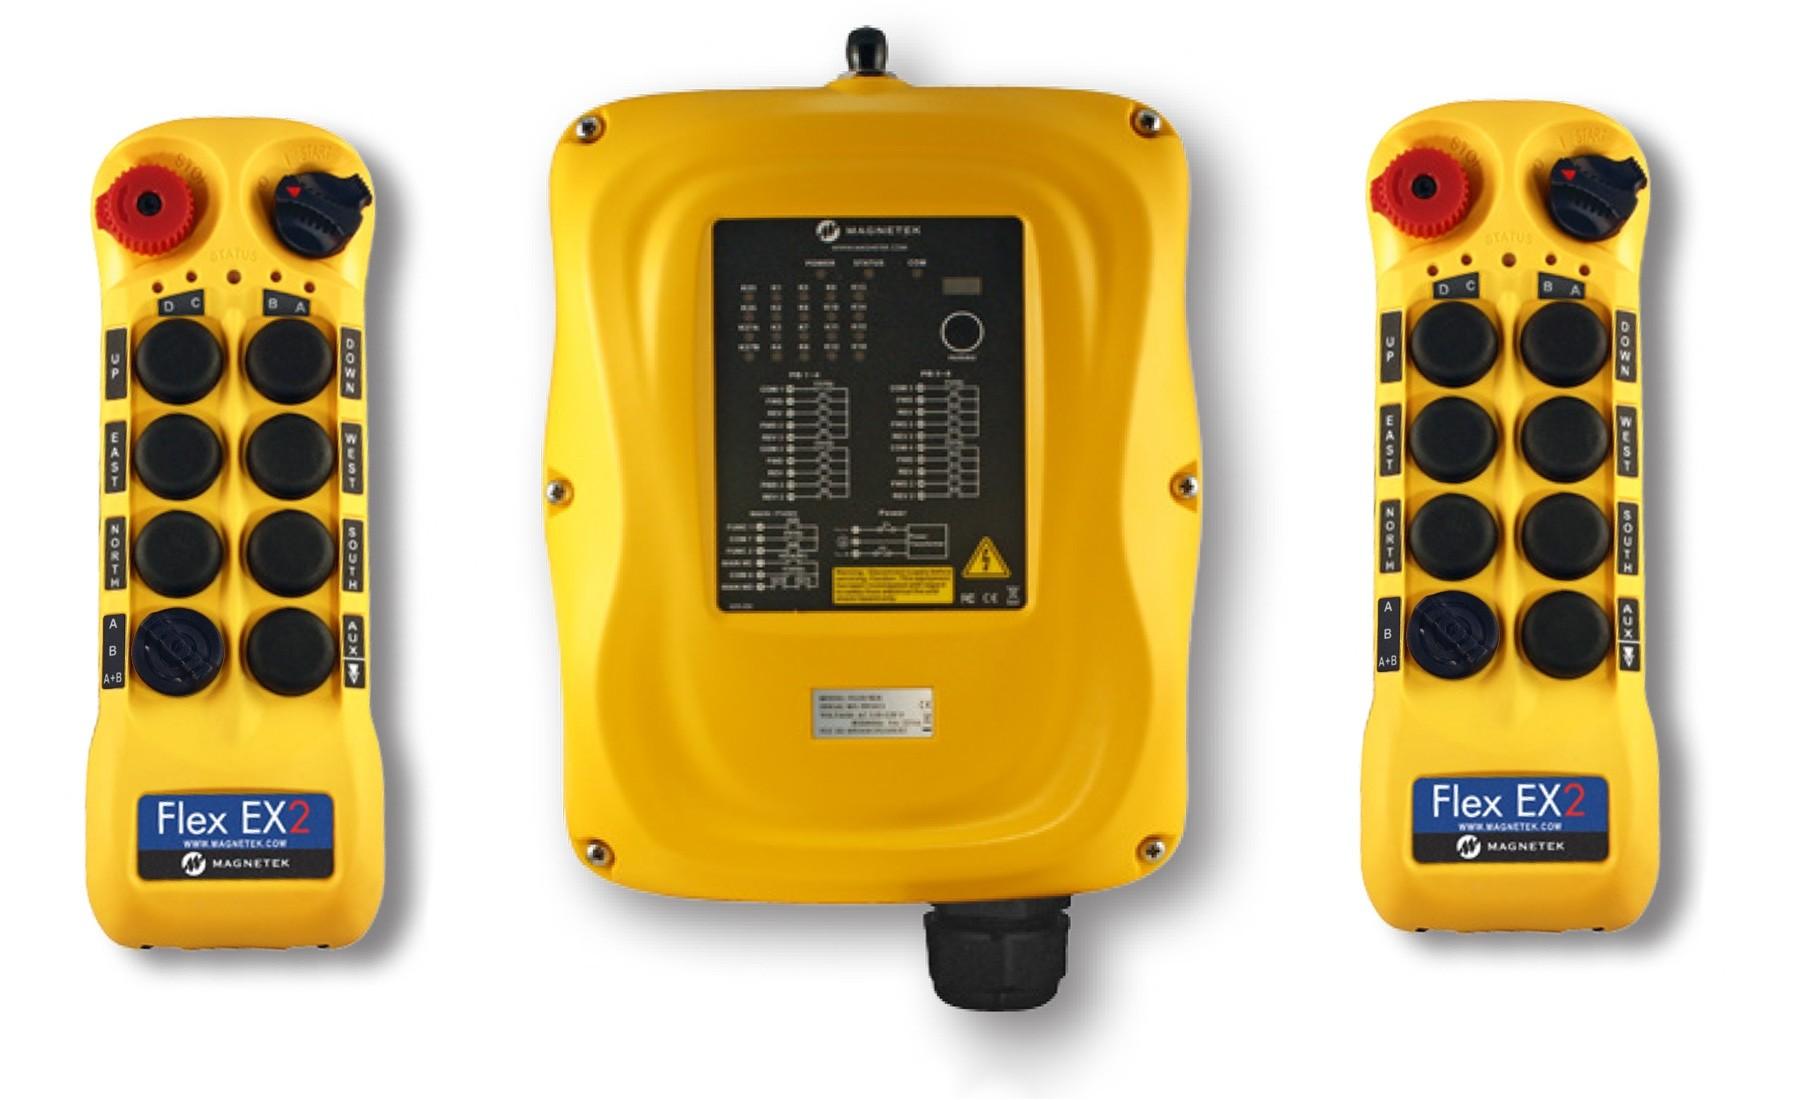 New Enrange Flex 8EX2 System, 4-Motion, 2-Speed, 2 Transmitters by Magnetek